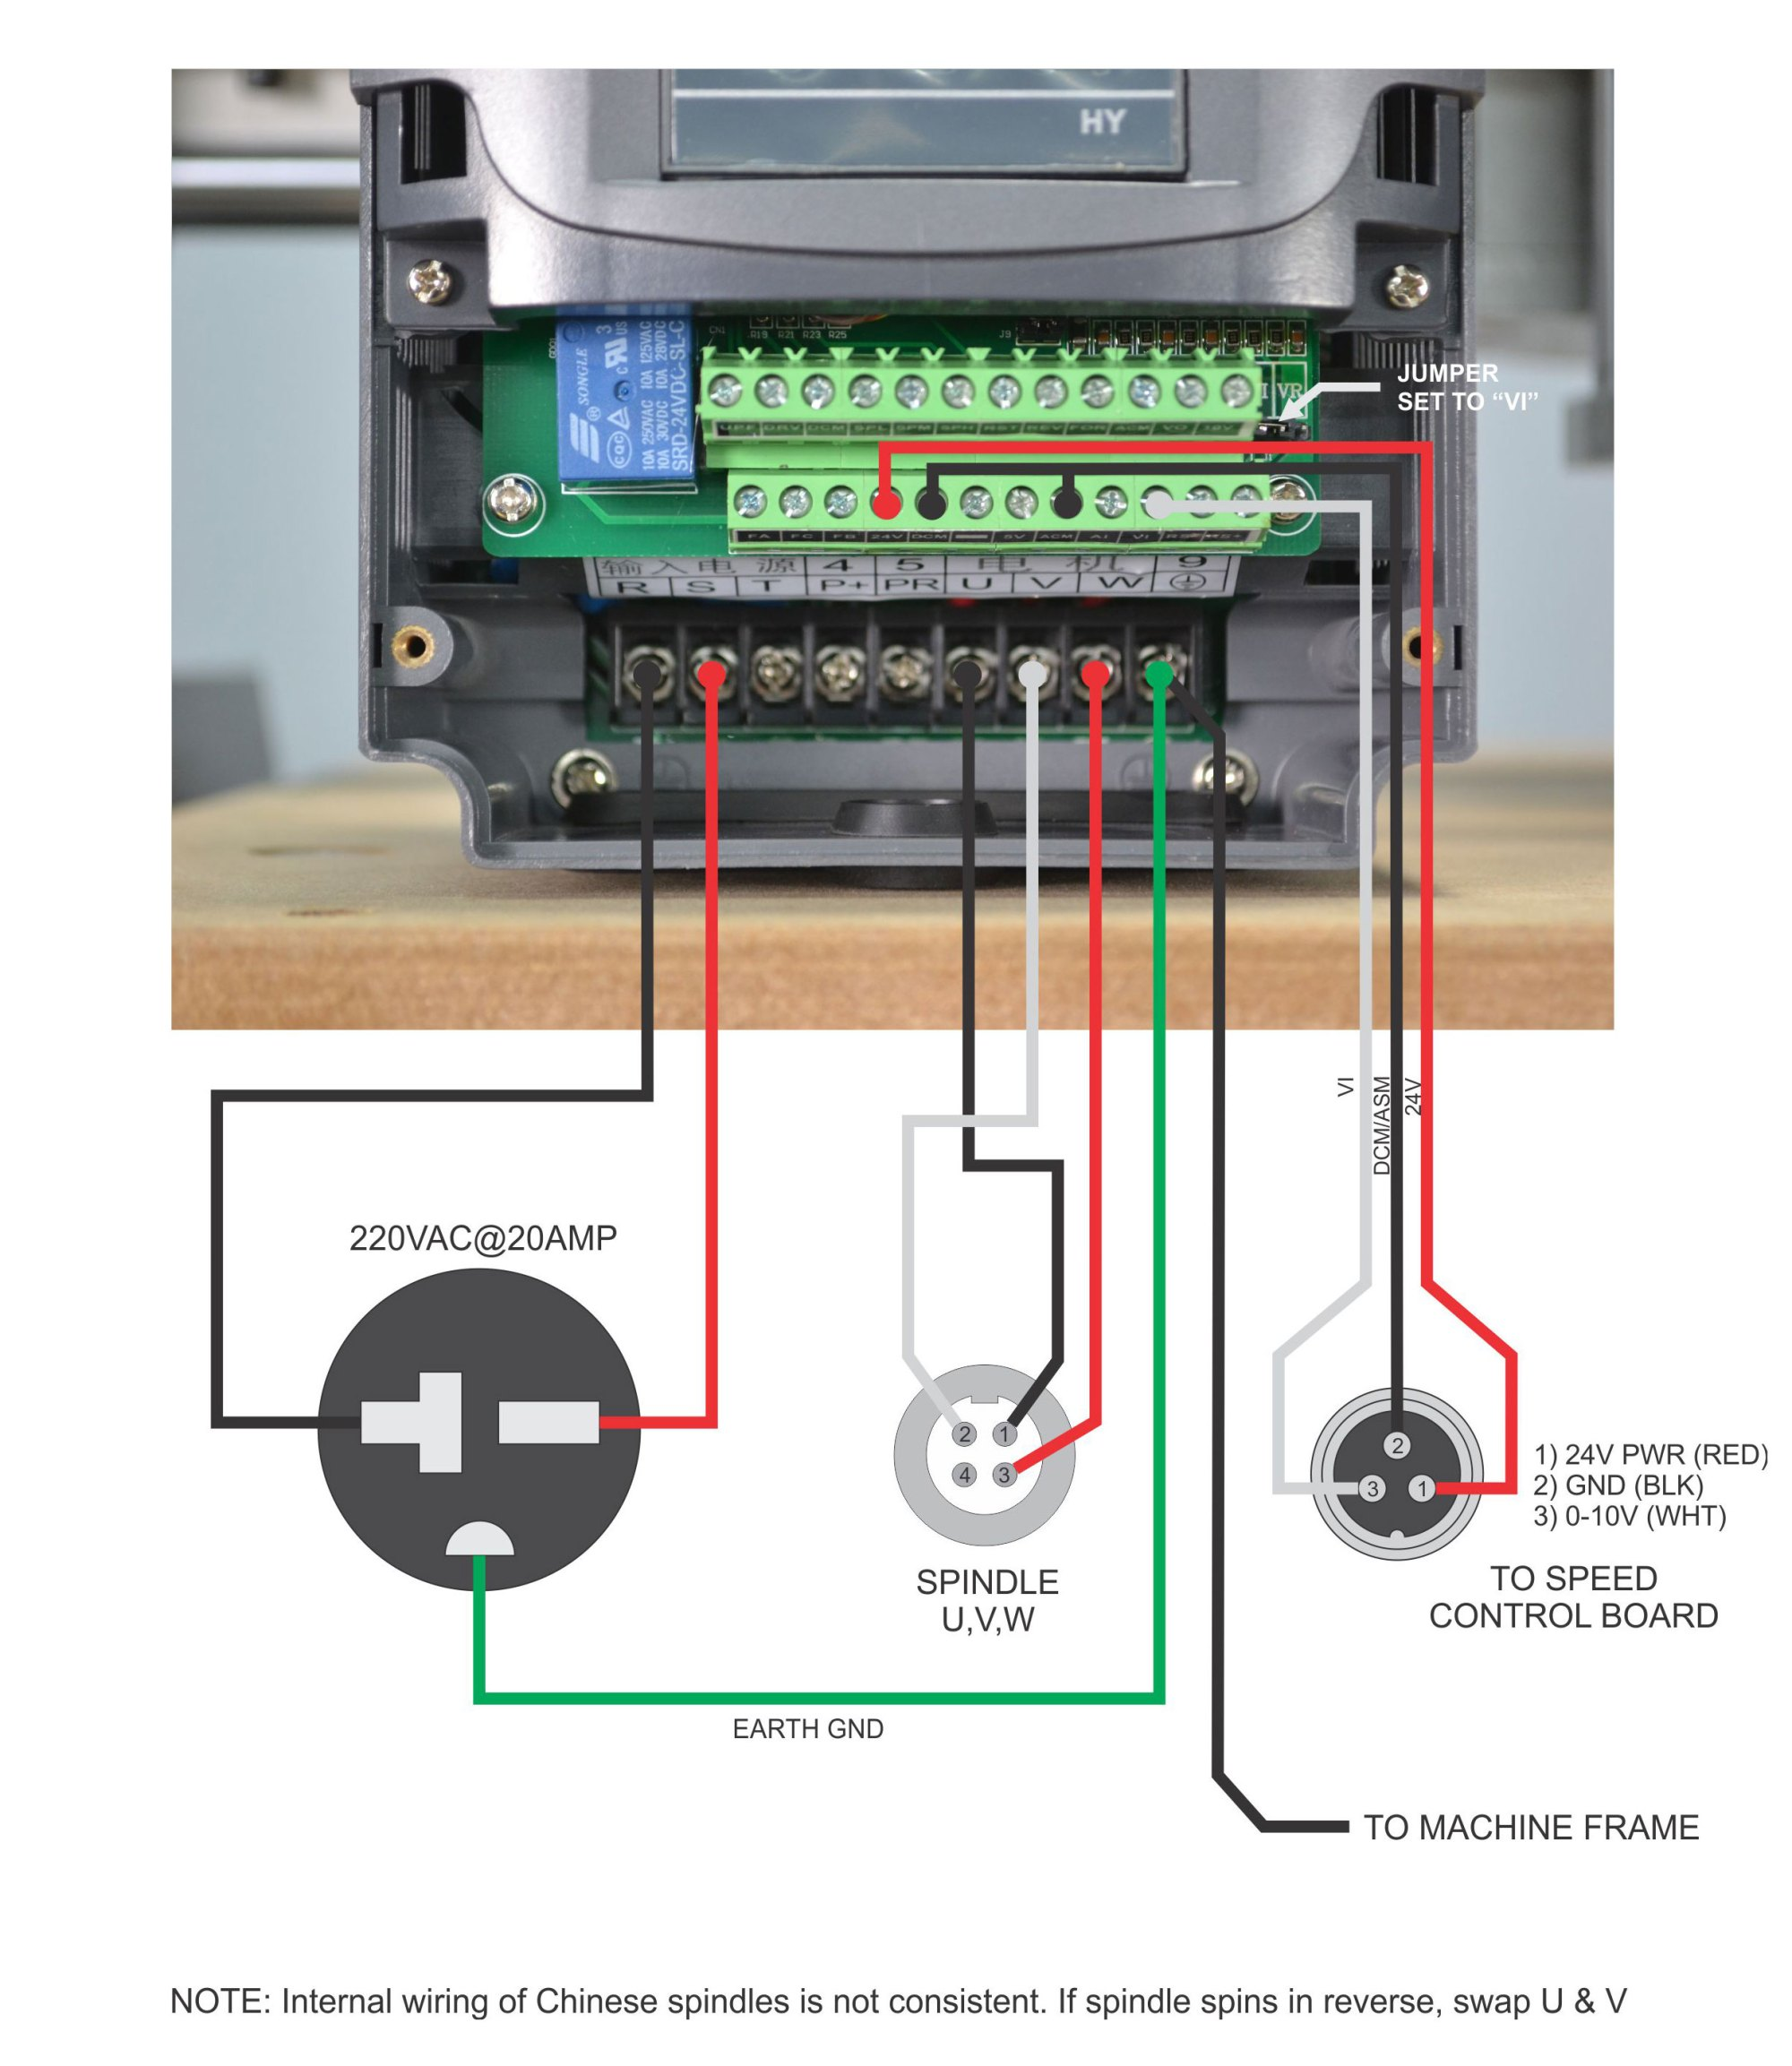 hight resolution of file vfd wiring diagram jpg probotix wiki honda motorcycle repair diagrams file vfd wiring diagram jpg